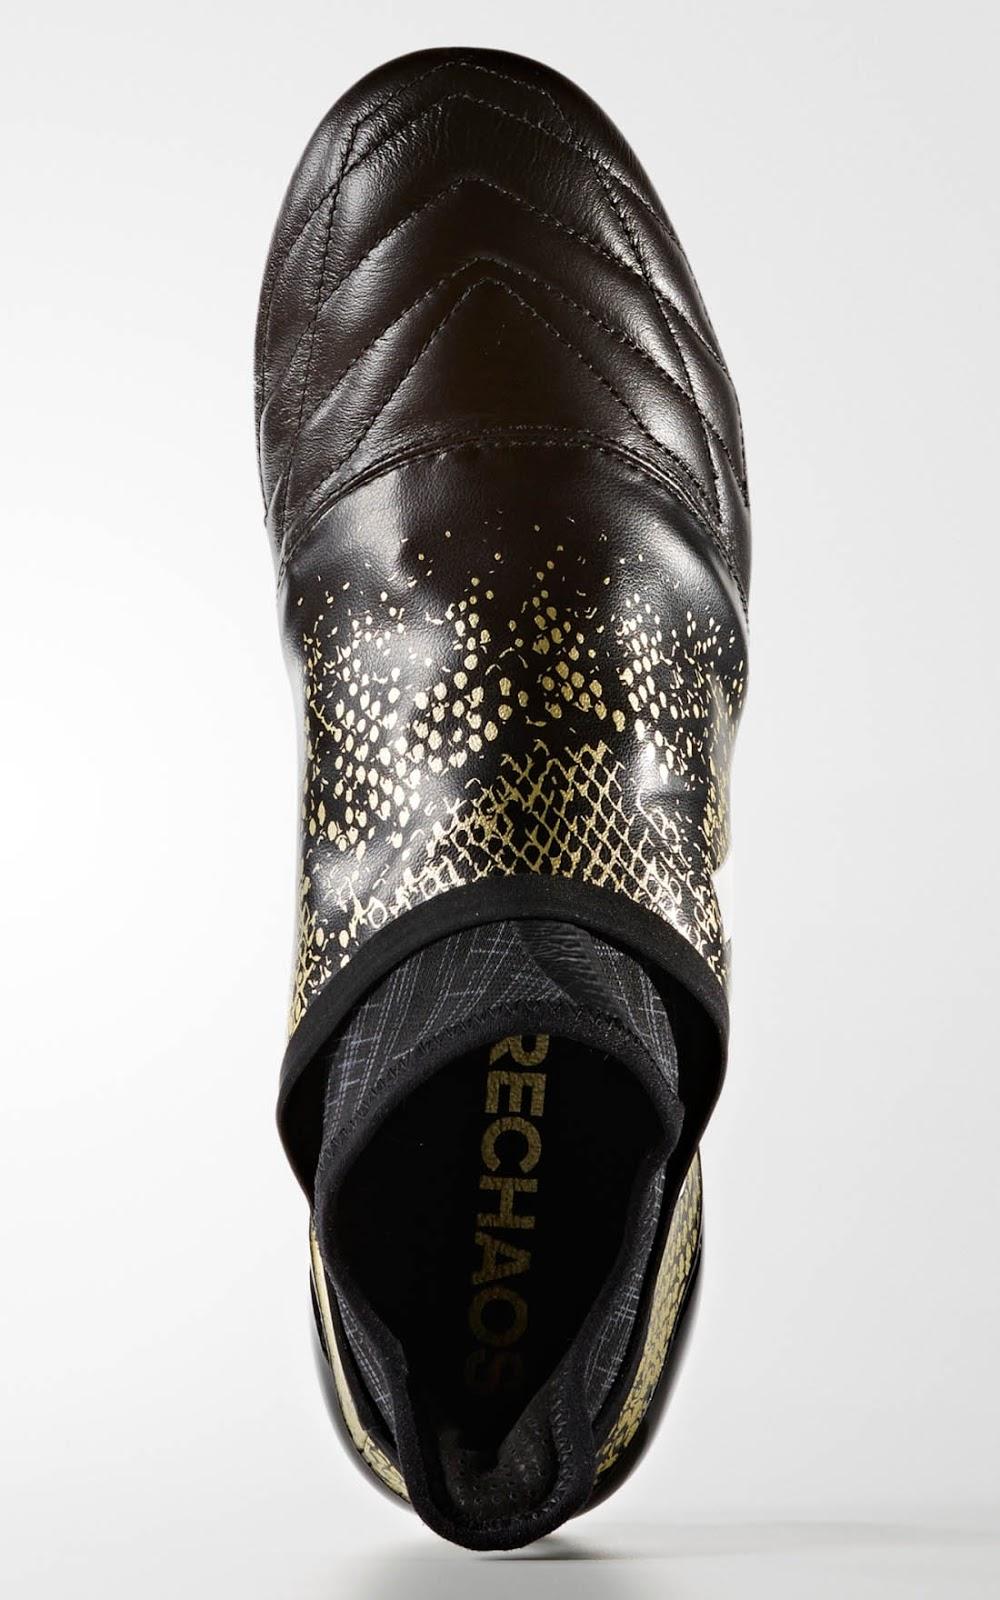 2018 sneaker sale a0fe0 4f35a The Black White Gold Adidas X PureChaos 16.1  ... 7576082de4d59